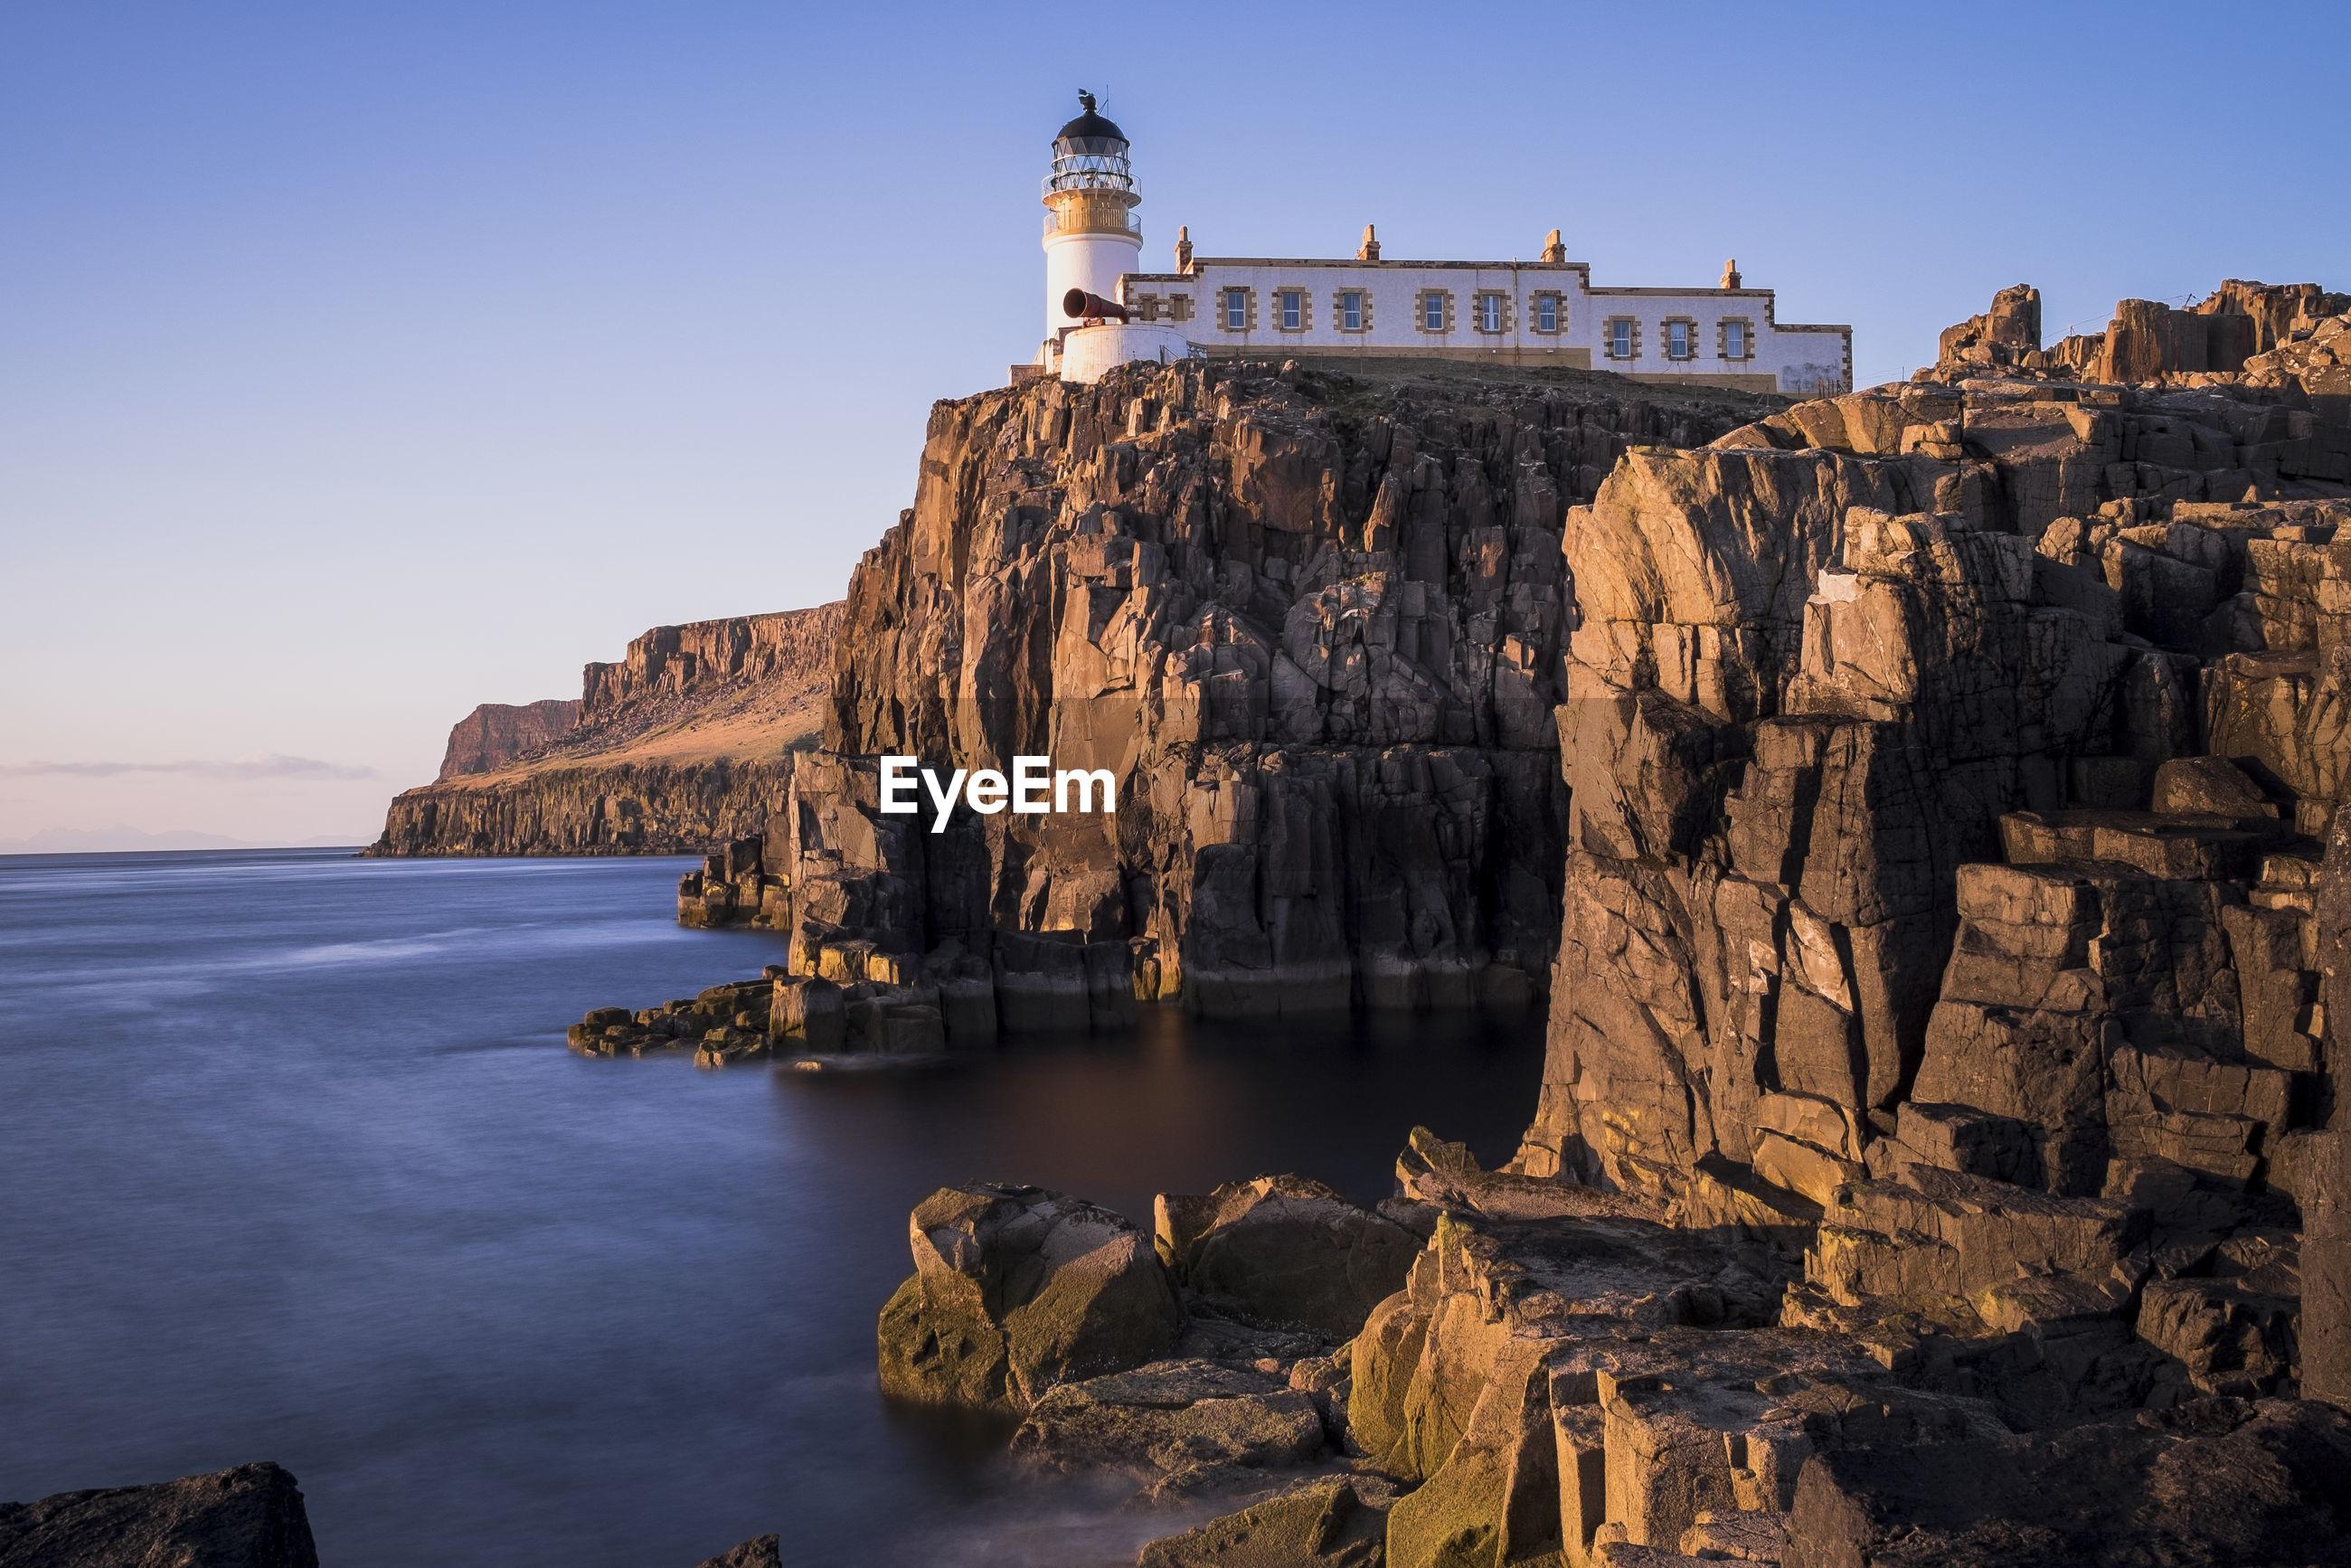 Nest point lighthouse on the isle of skye